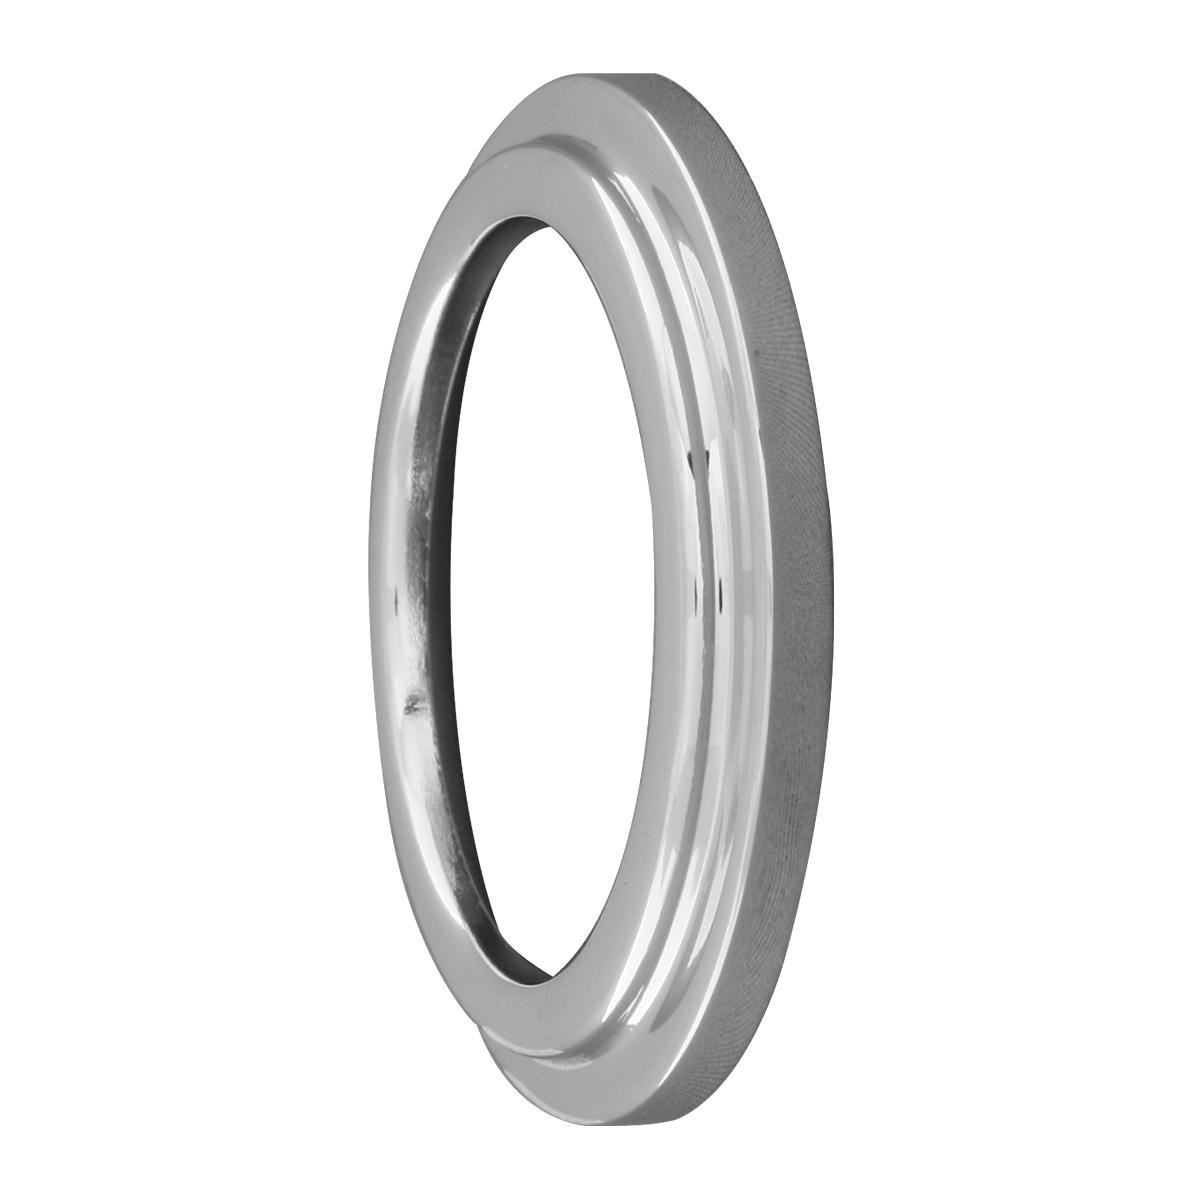 Chrome Steel Gauge Cover for FL